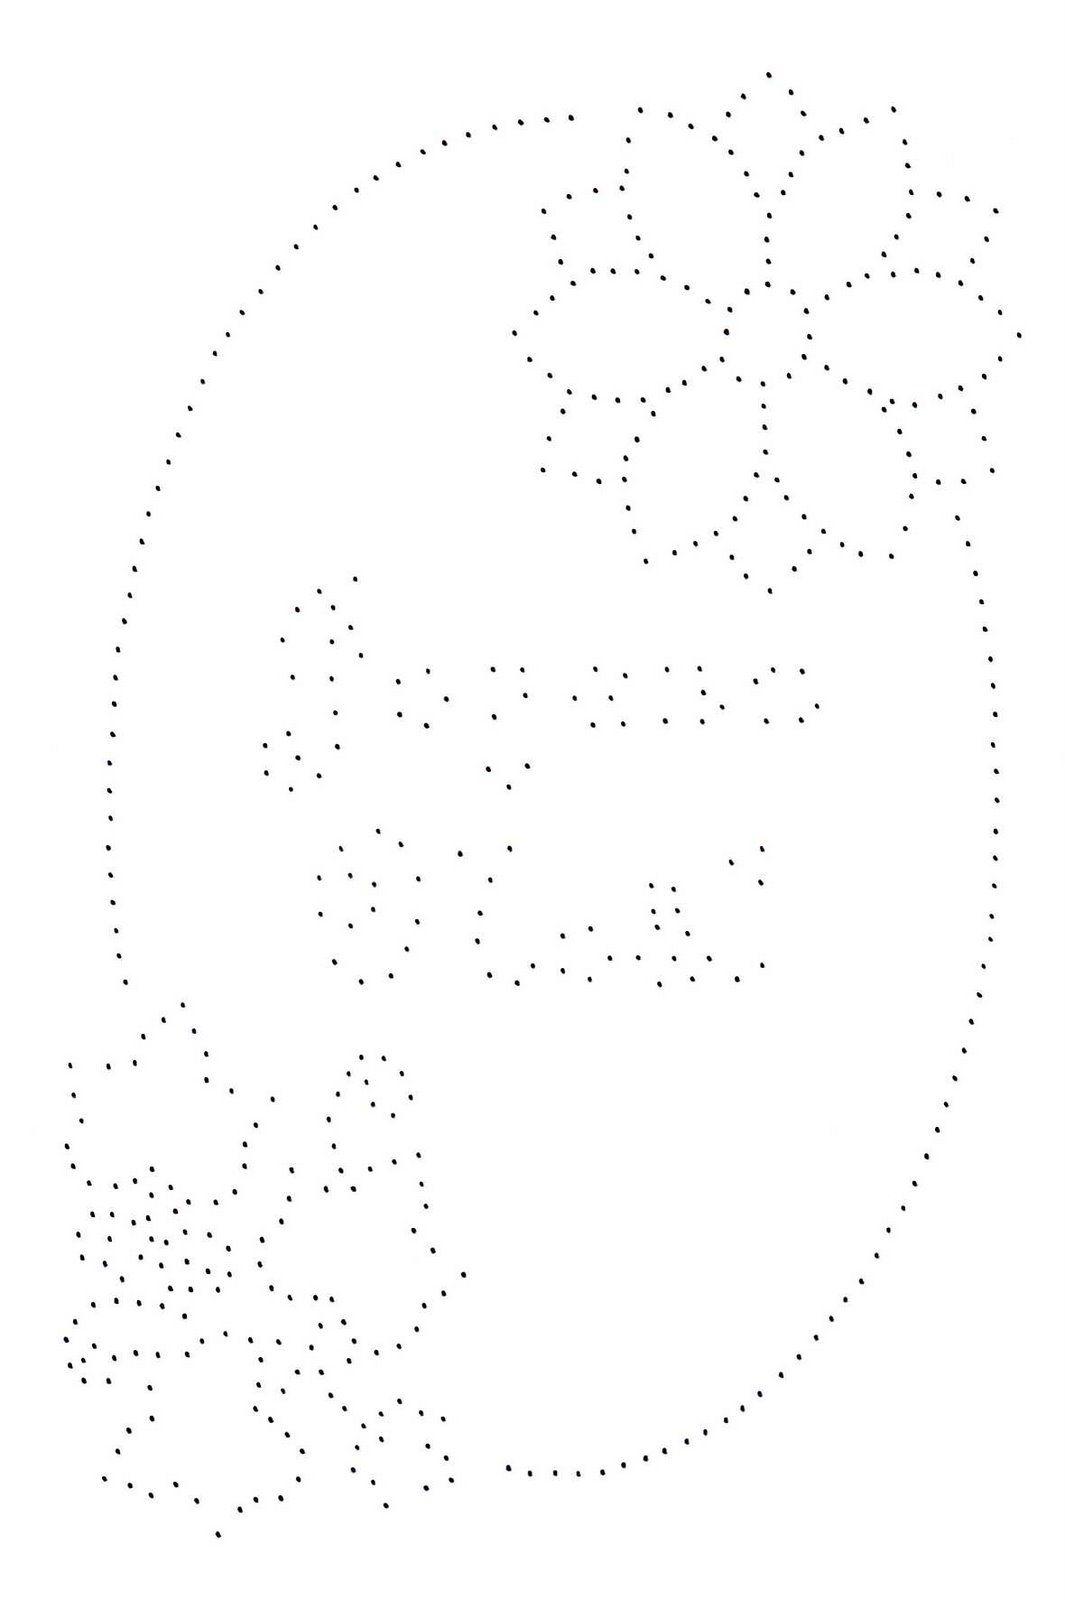 Картинки для изонити с точками, маквин